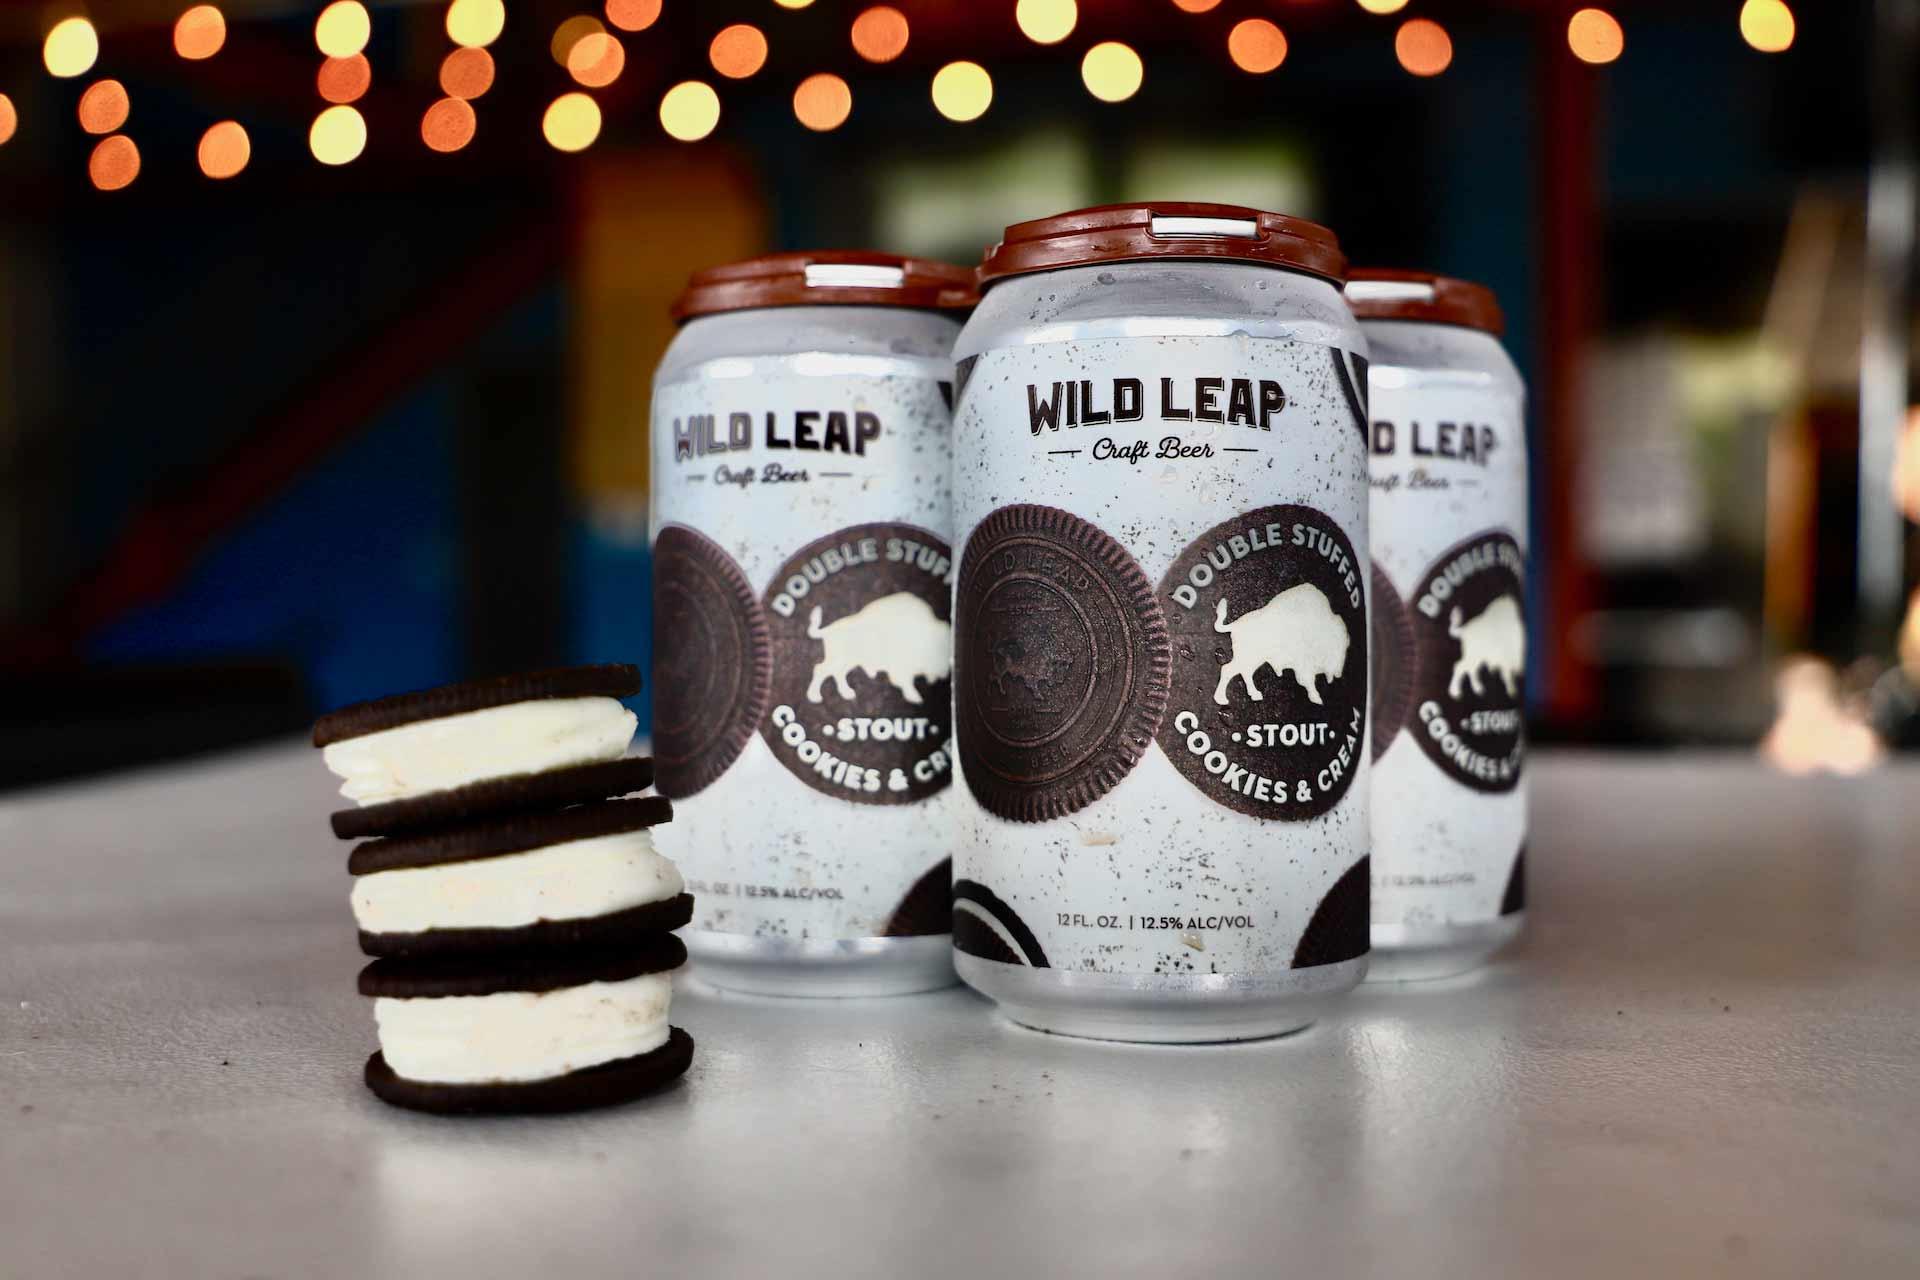 Wild-Leap-Double-Stuffed-Cookies-Cream-Stout